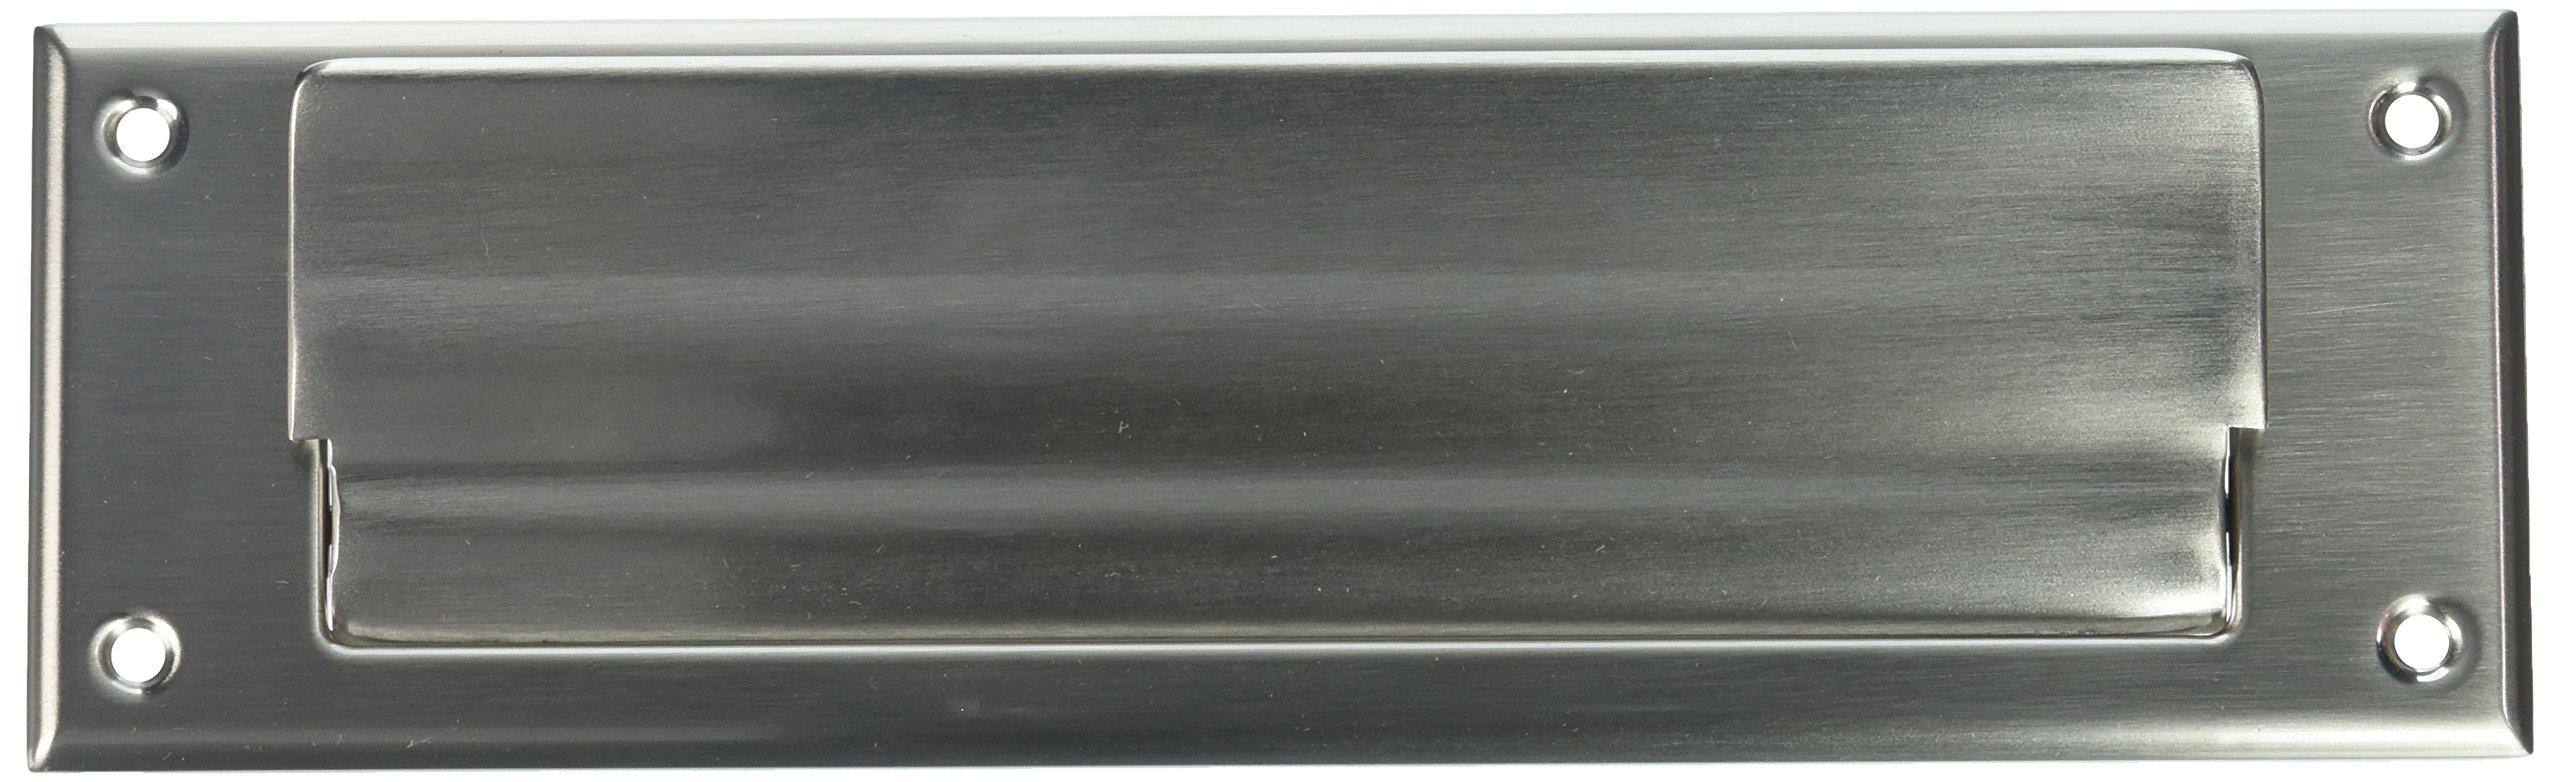 Baldwin 0015150 Letter Box Plate, Satin Nickel